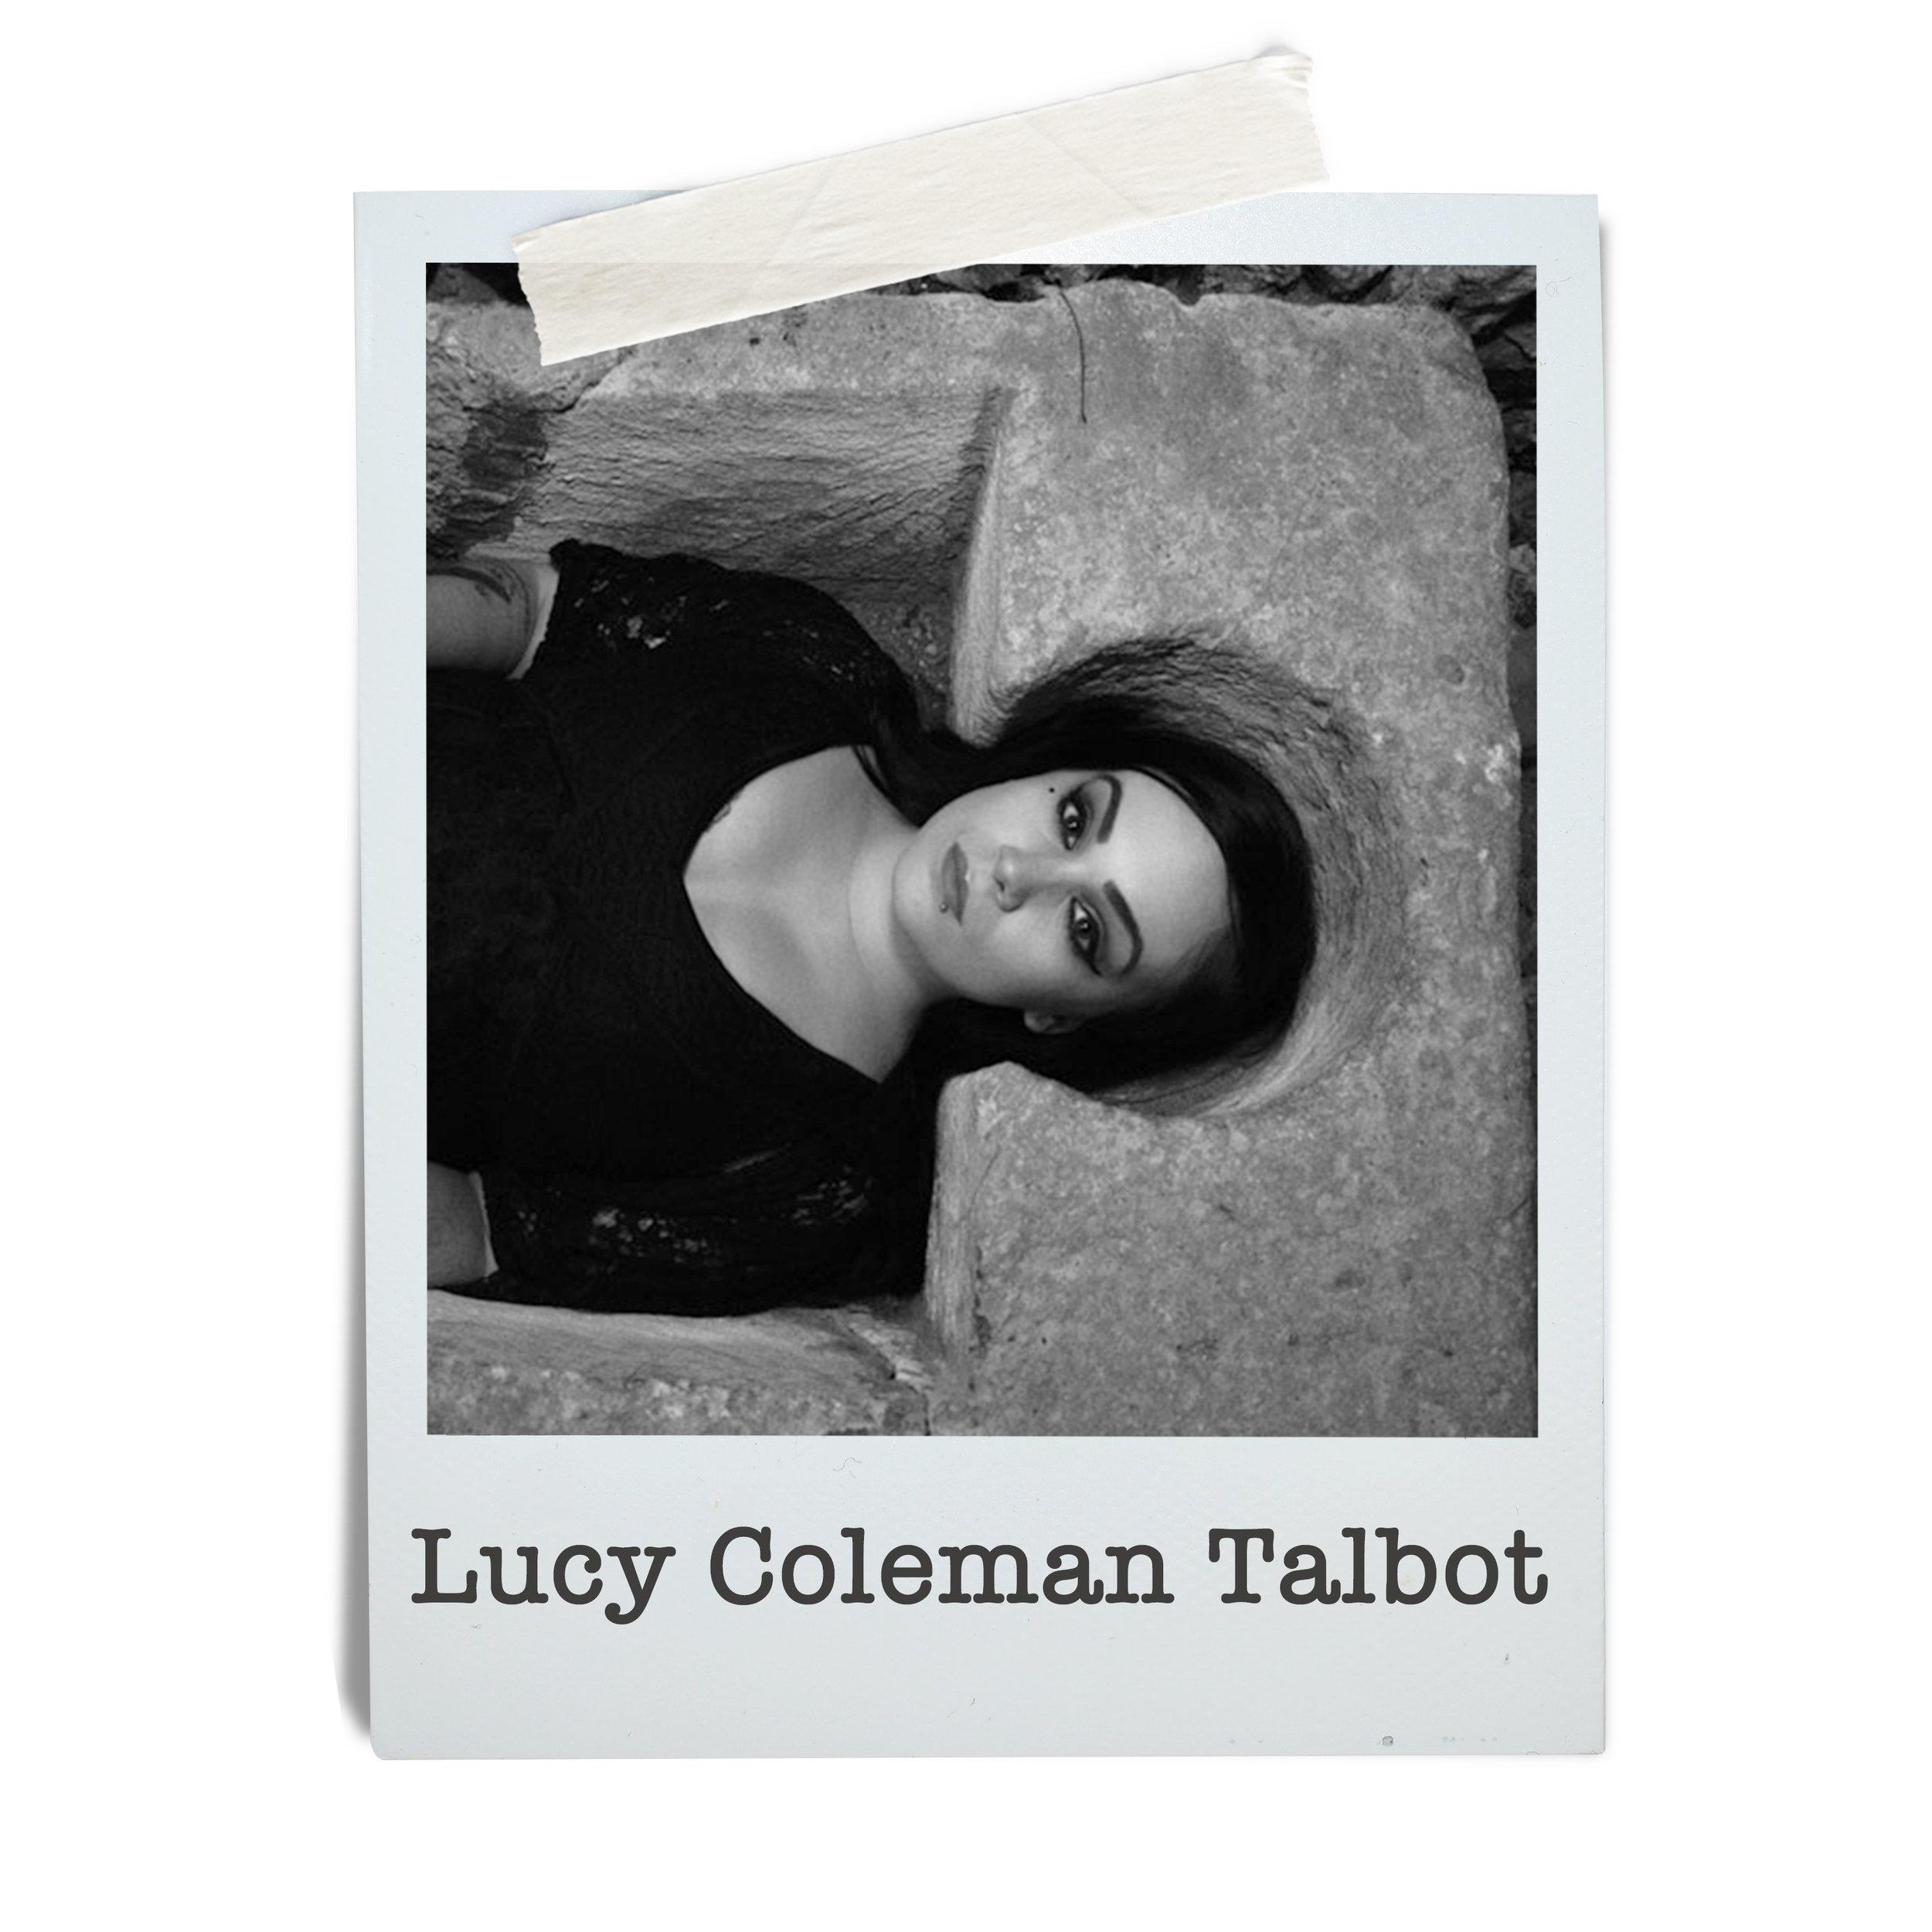 Lucy Coleman Talbot